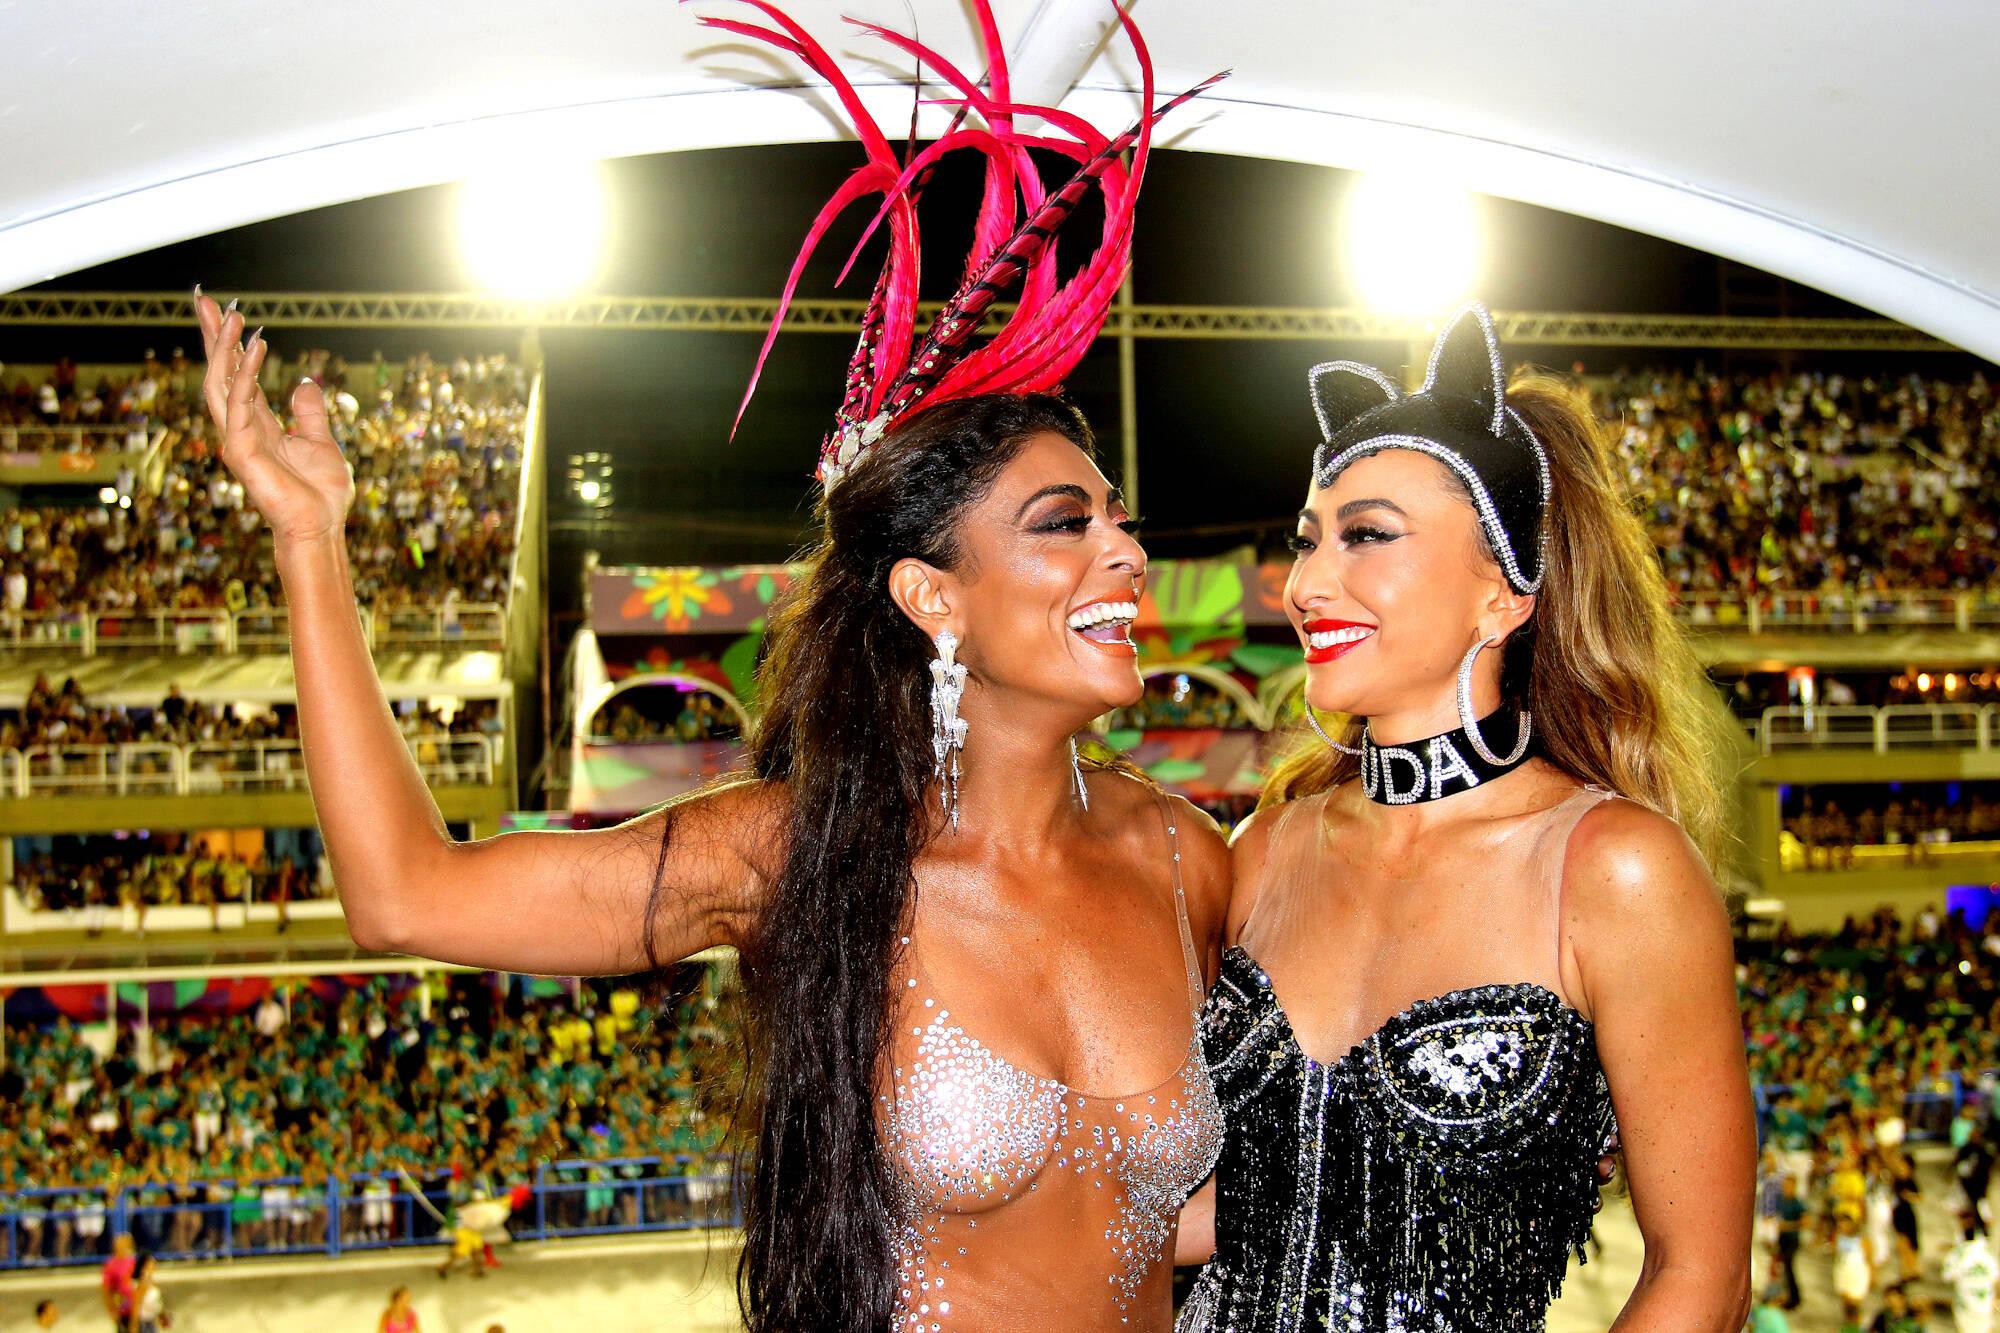 Juliana Paes e Sabrina Sato no Camarote Grande Rio na última segunda-feira (12), no Rio de Janeiro. Foto: eny miranda